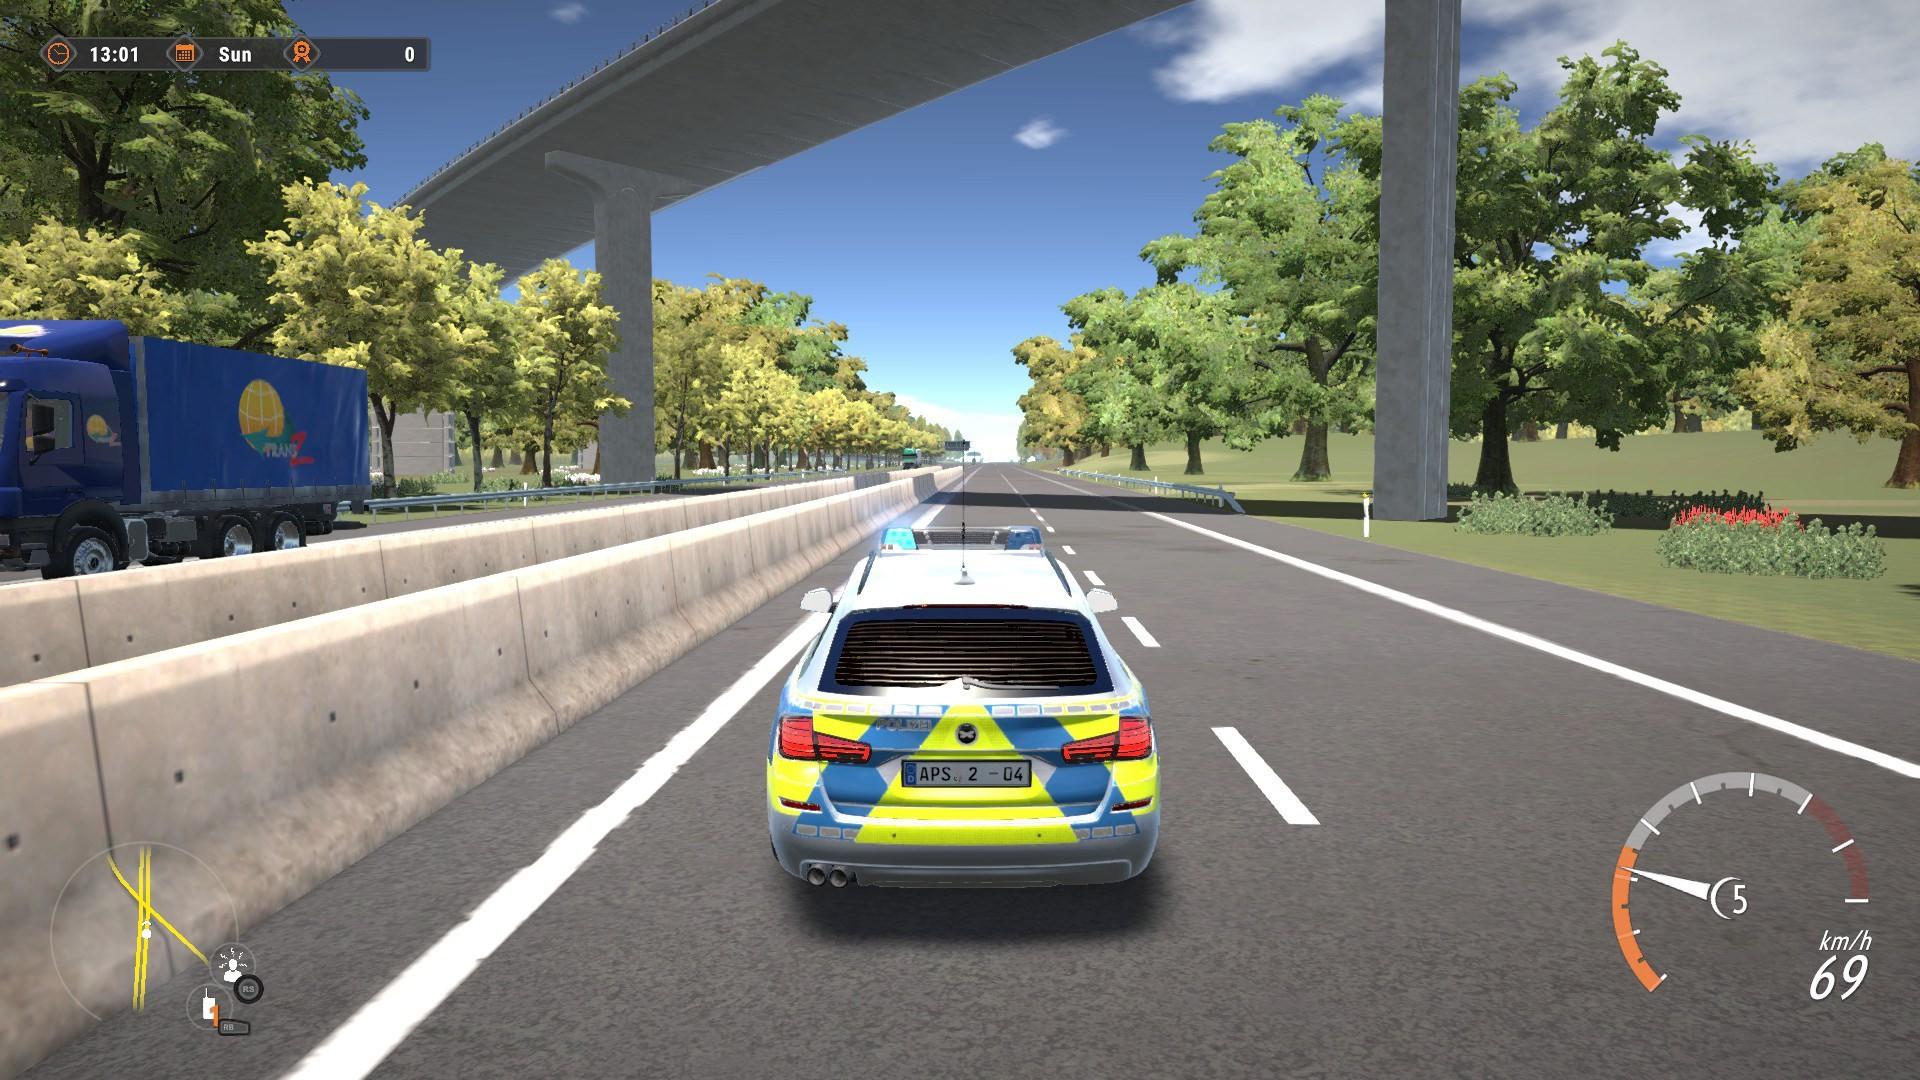 Autobahn Police Simulator 2 – November 4